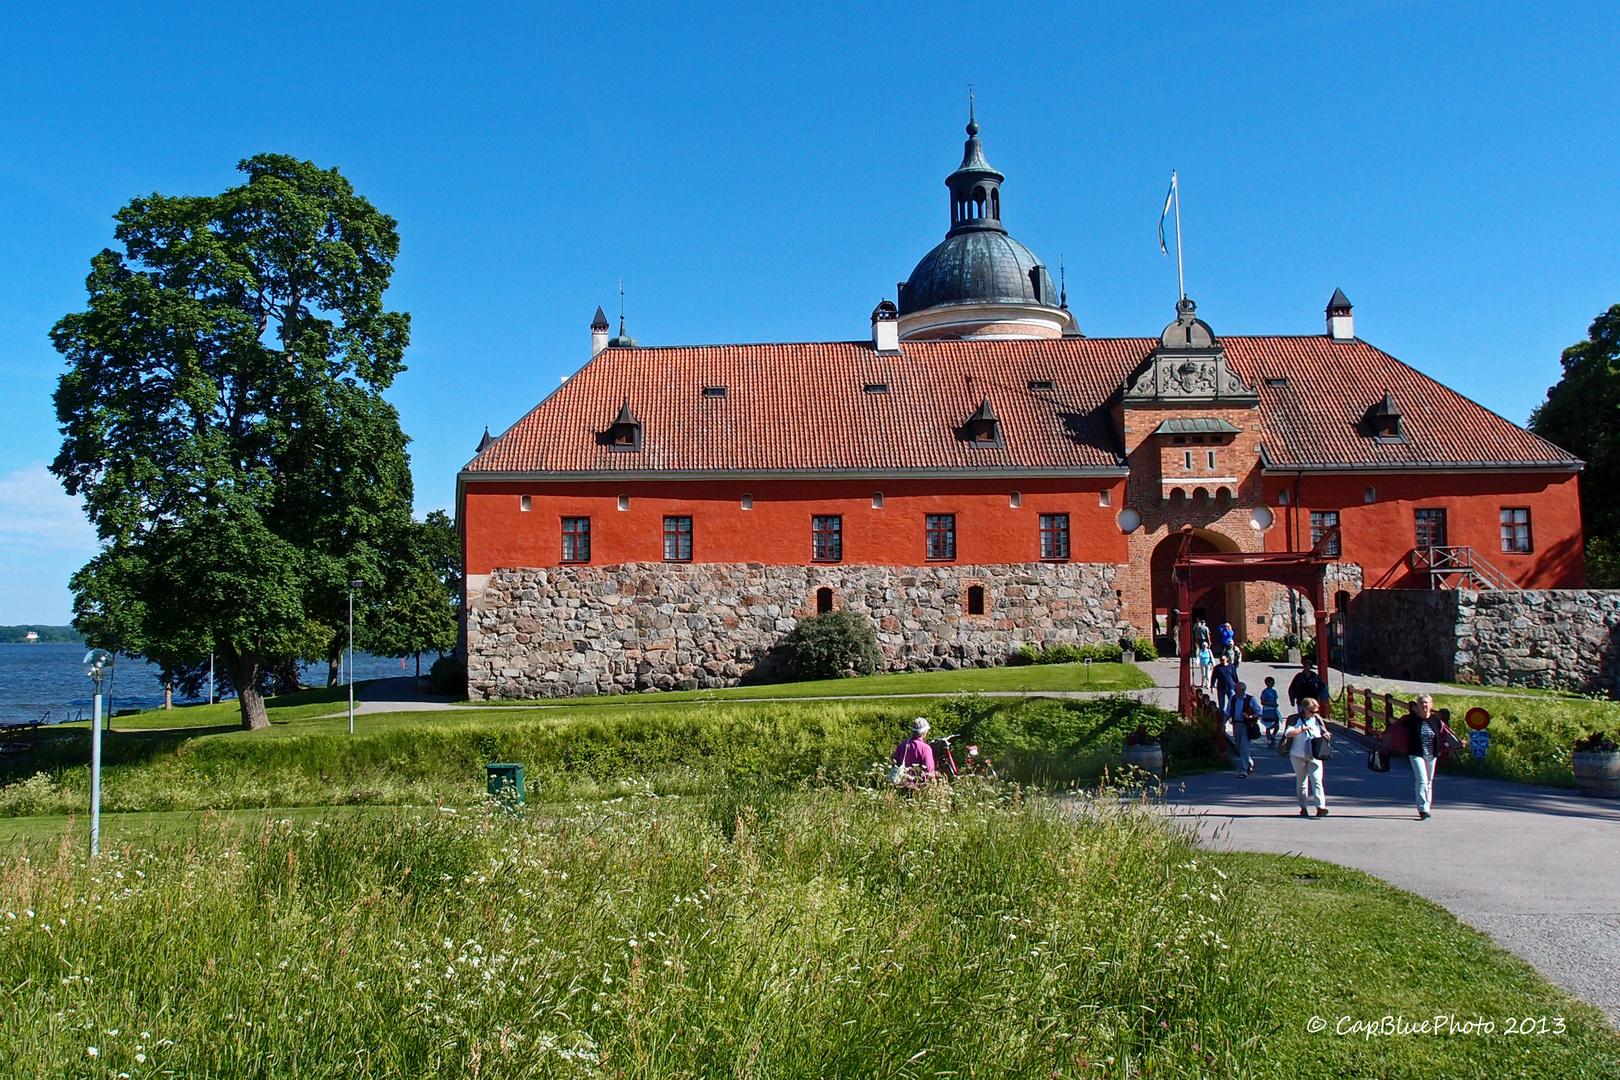 Schloss Gripsholm bei Mariefred